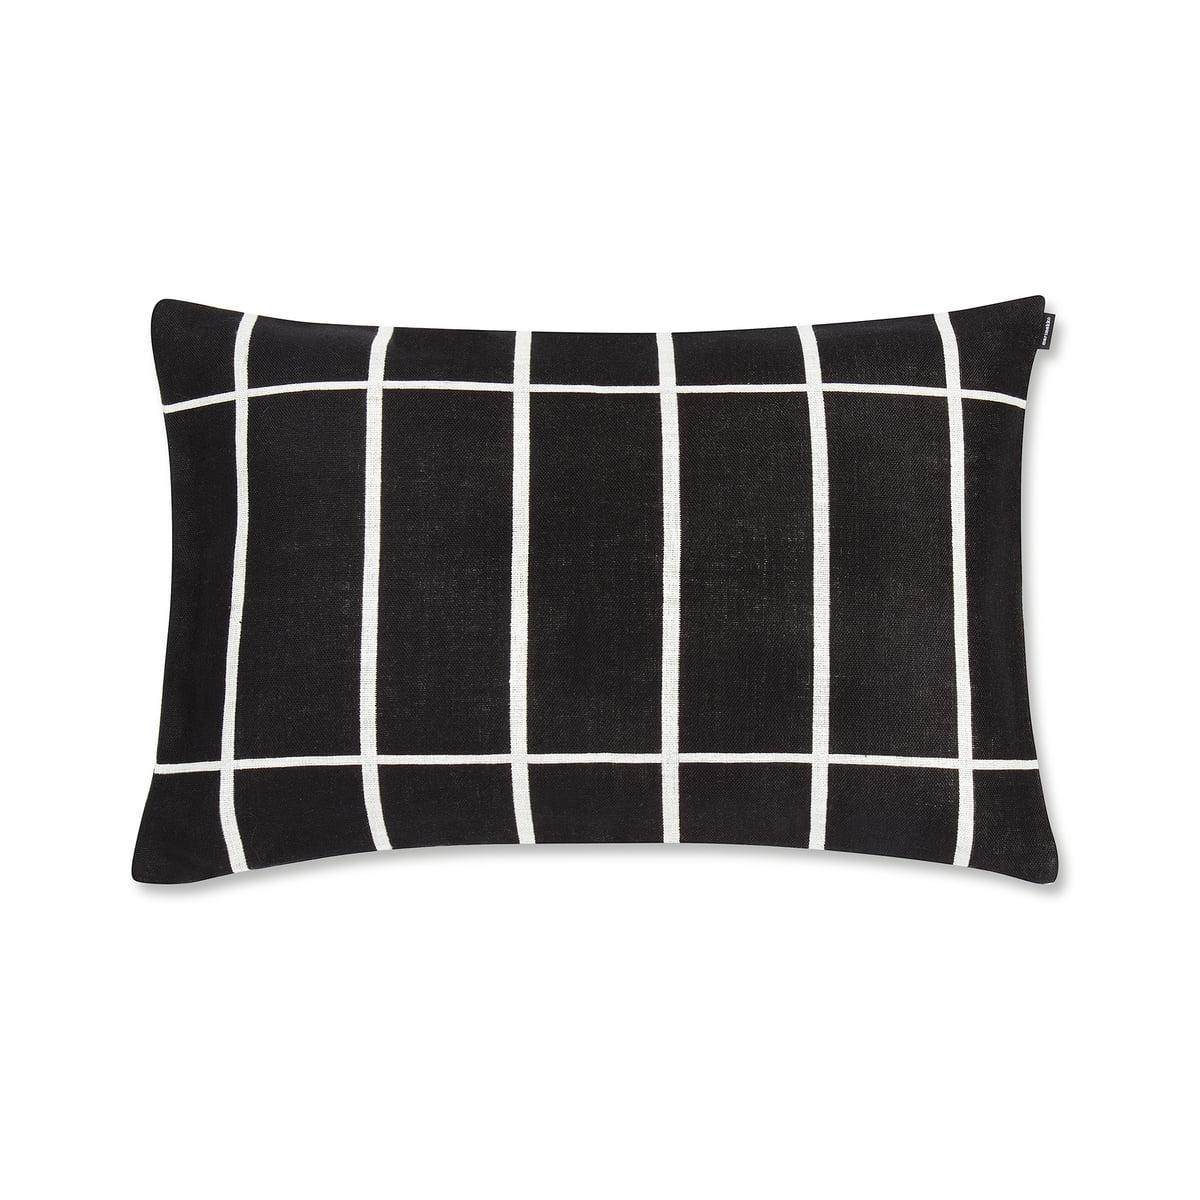 marimekko tiiliskivi kissenbezug 40 x 60 cm schwarz wei schwarz wei t 40 h 0 b 60 online. Black Bedroom Furniture Sets. Home Design Ideas